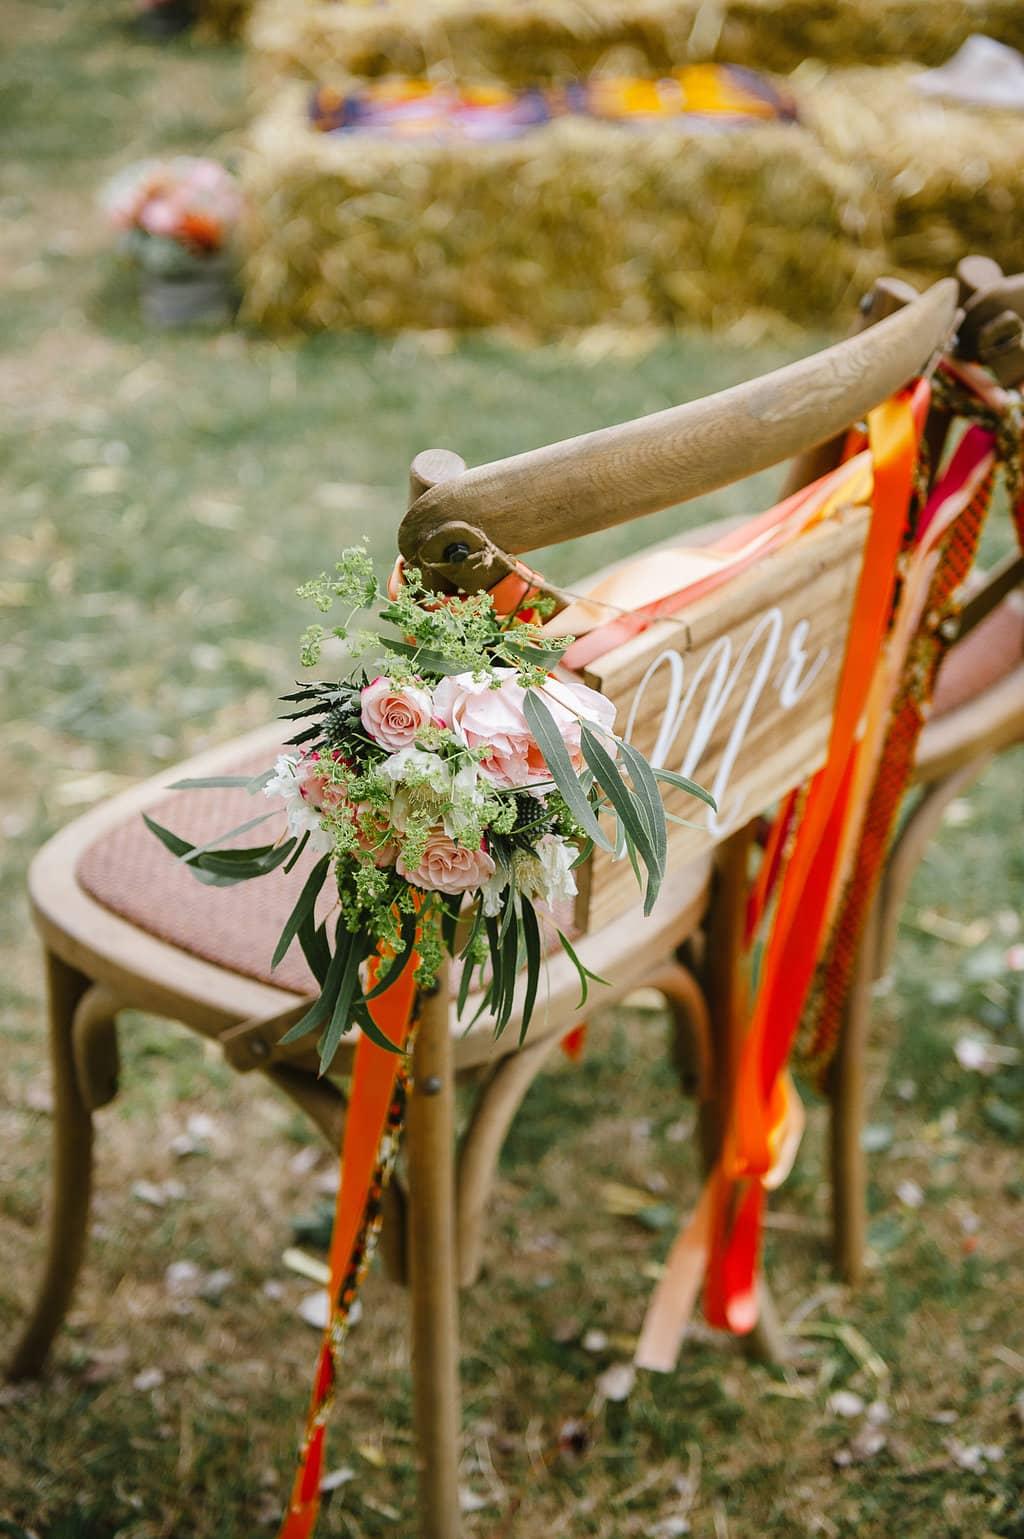 chaise-mariee-bouquet-ceremonie-champetre-mariage